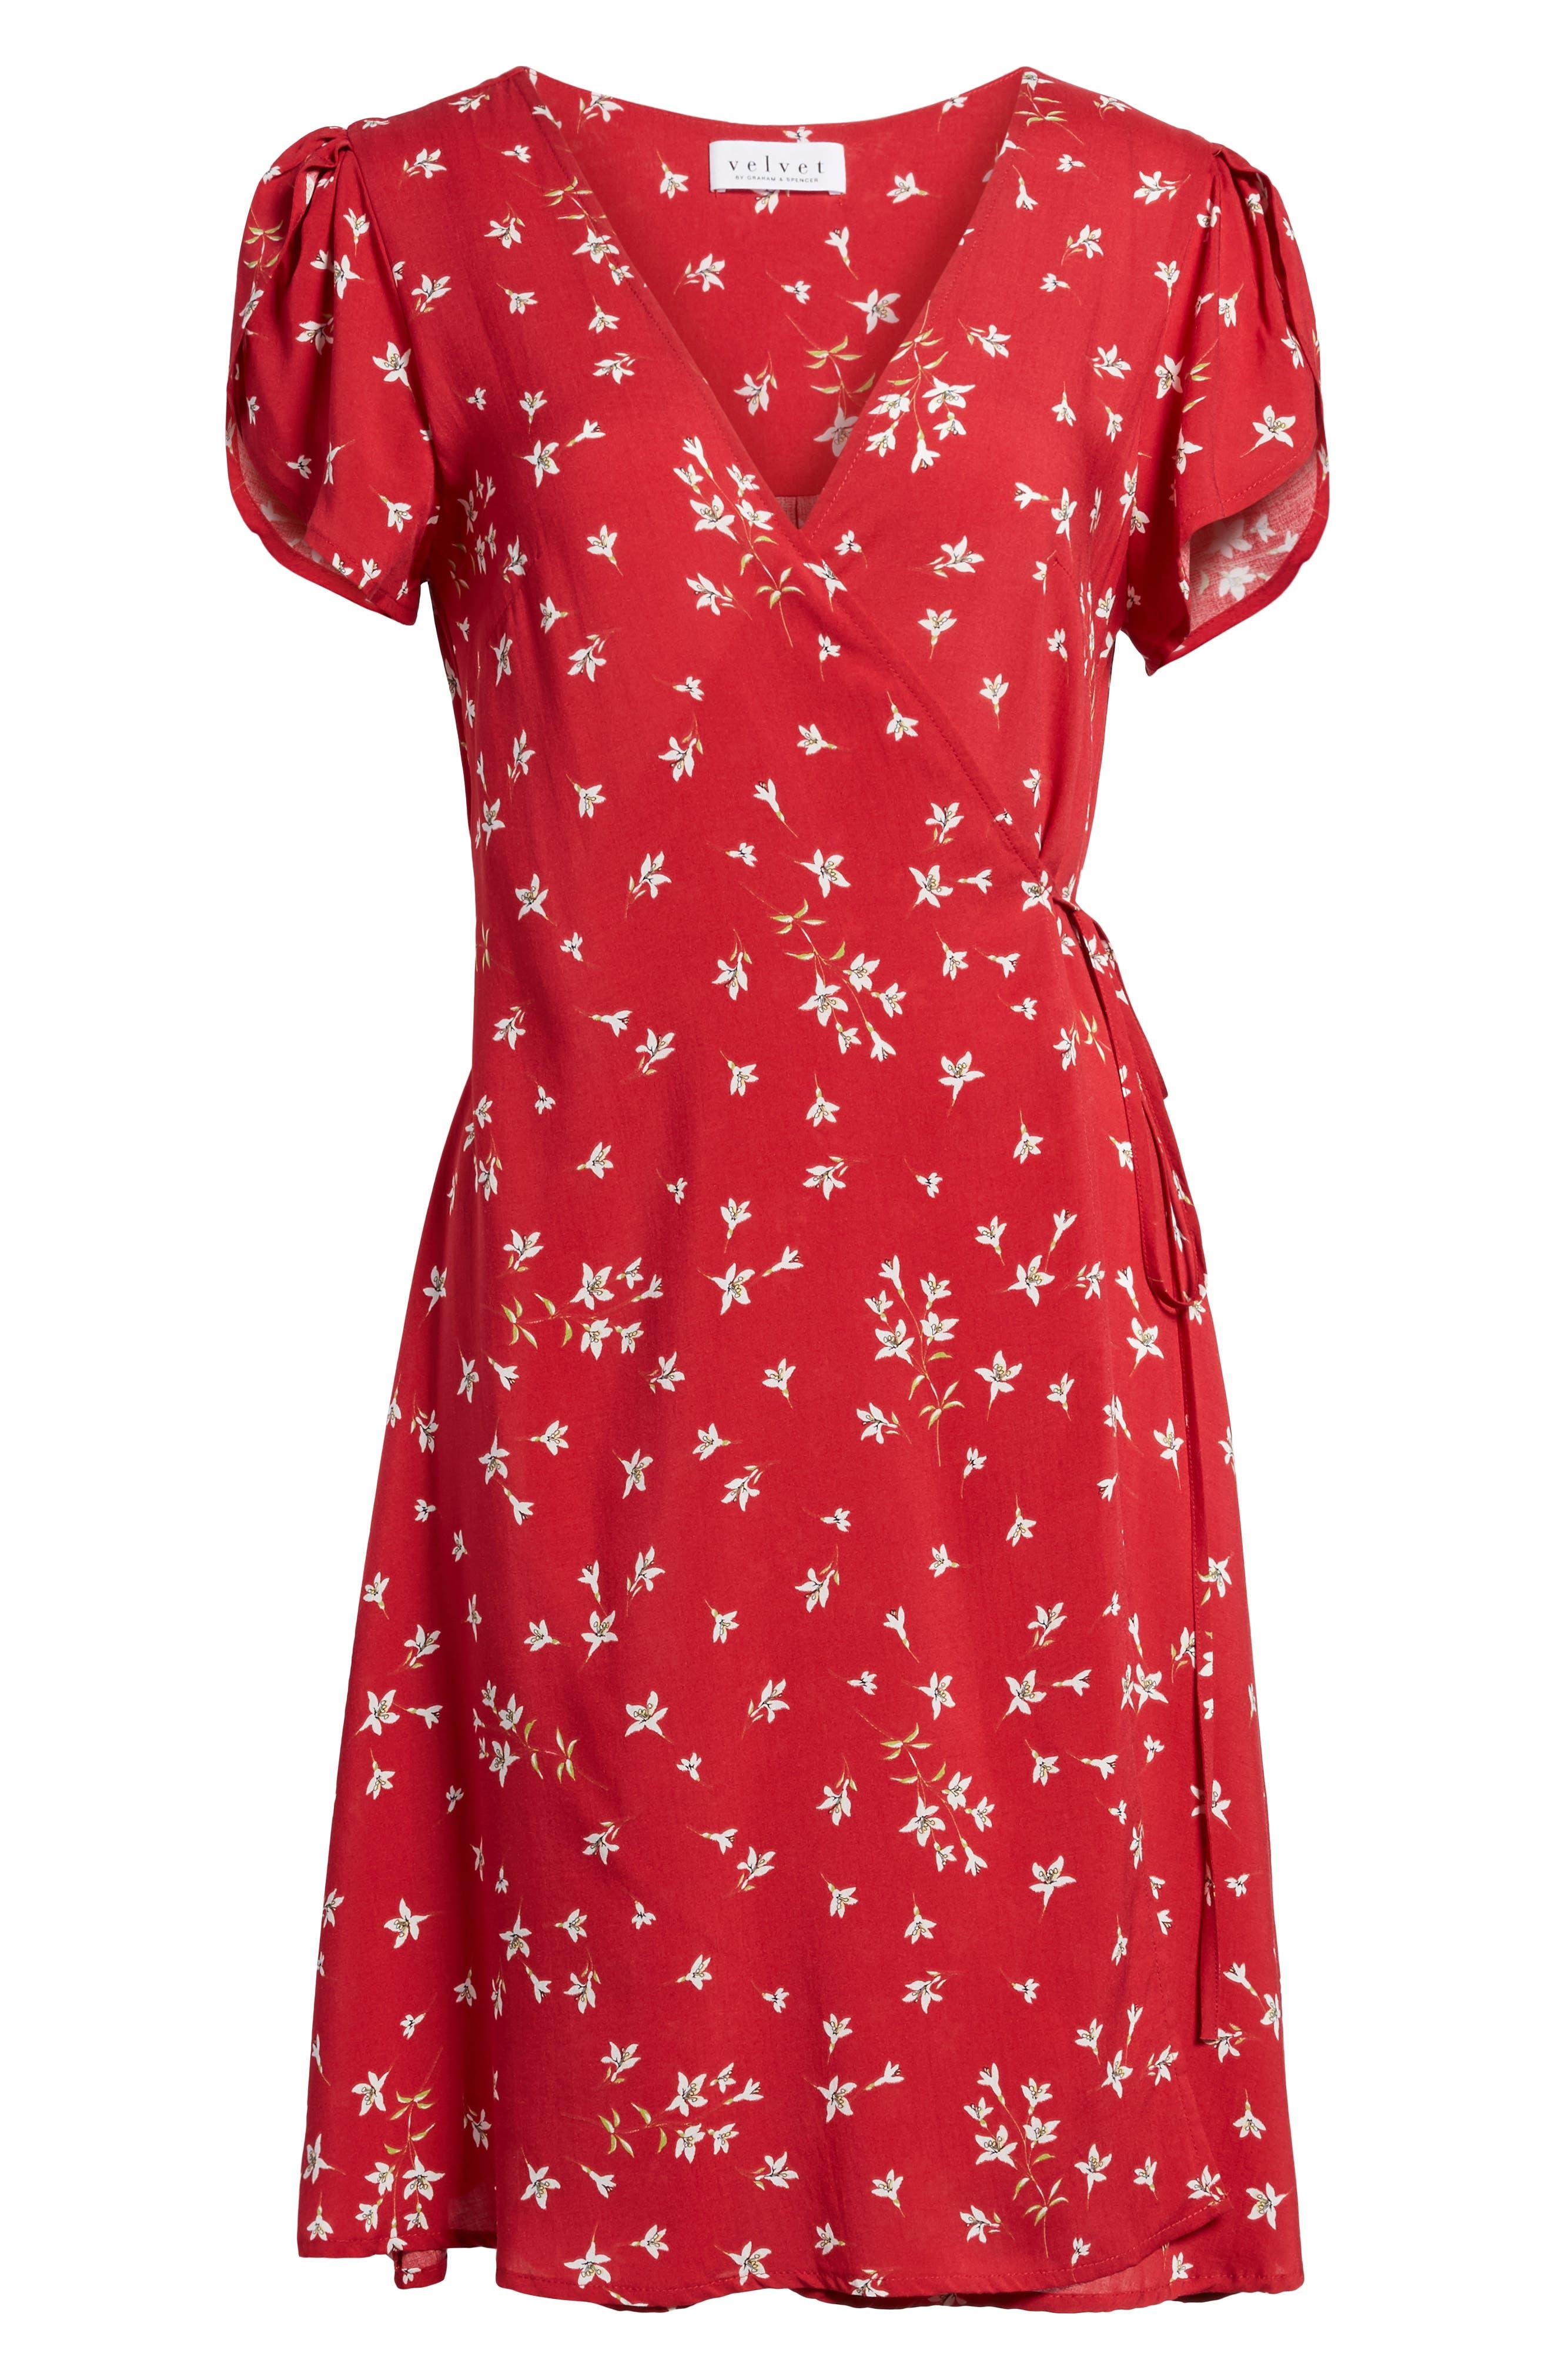 Spring Floral Wrap Dress,                             Alternate thumbnail 6, color,                             600